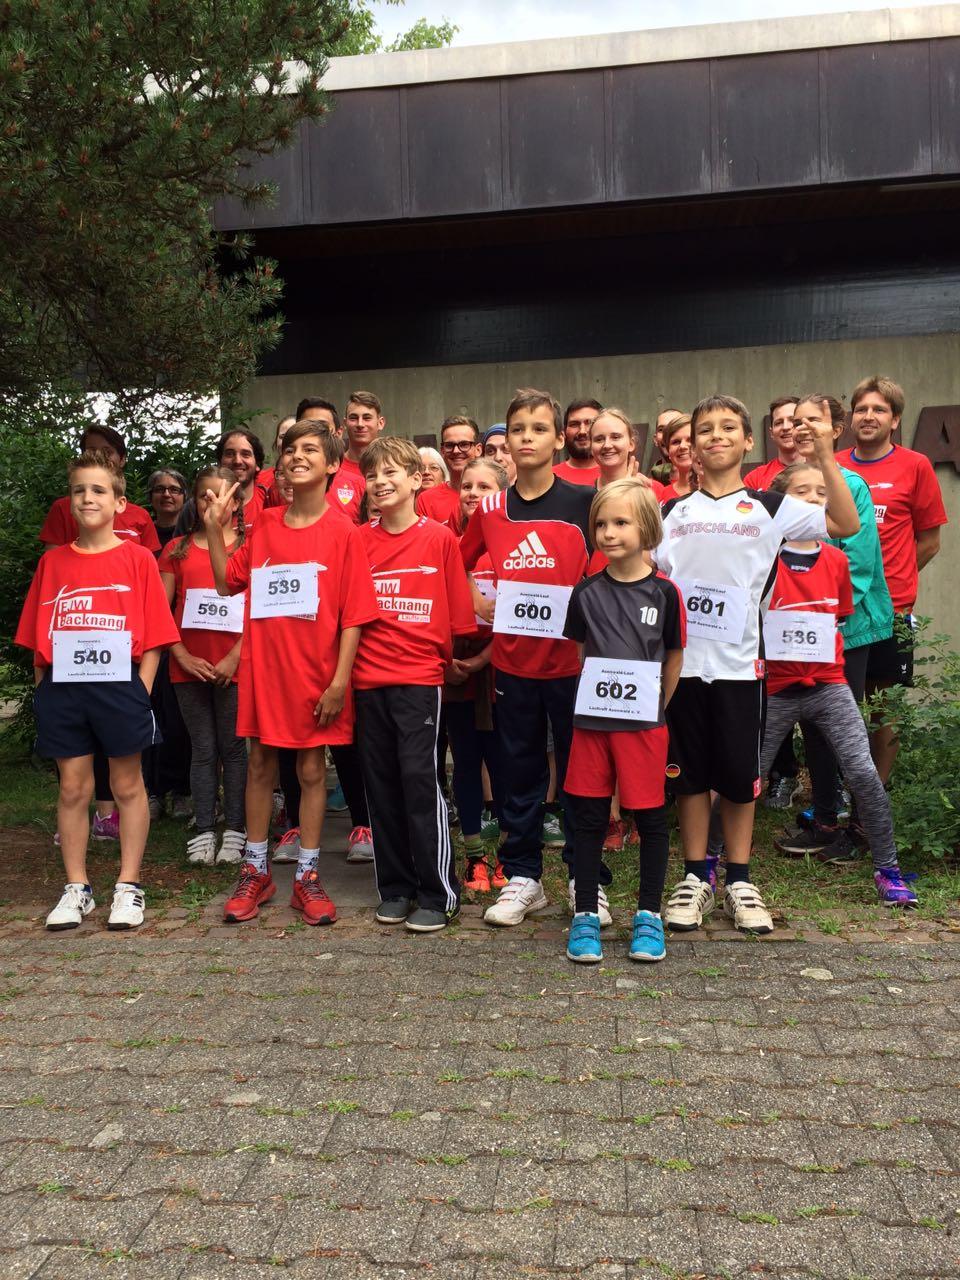 EJW-Sponsorenlauf beim Auenwaldlauf